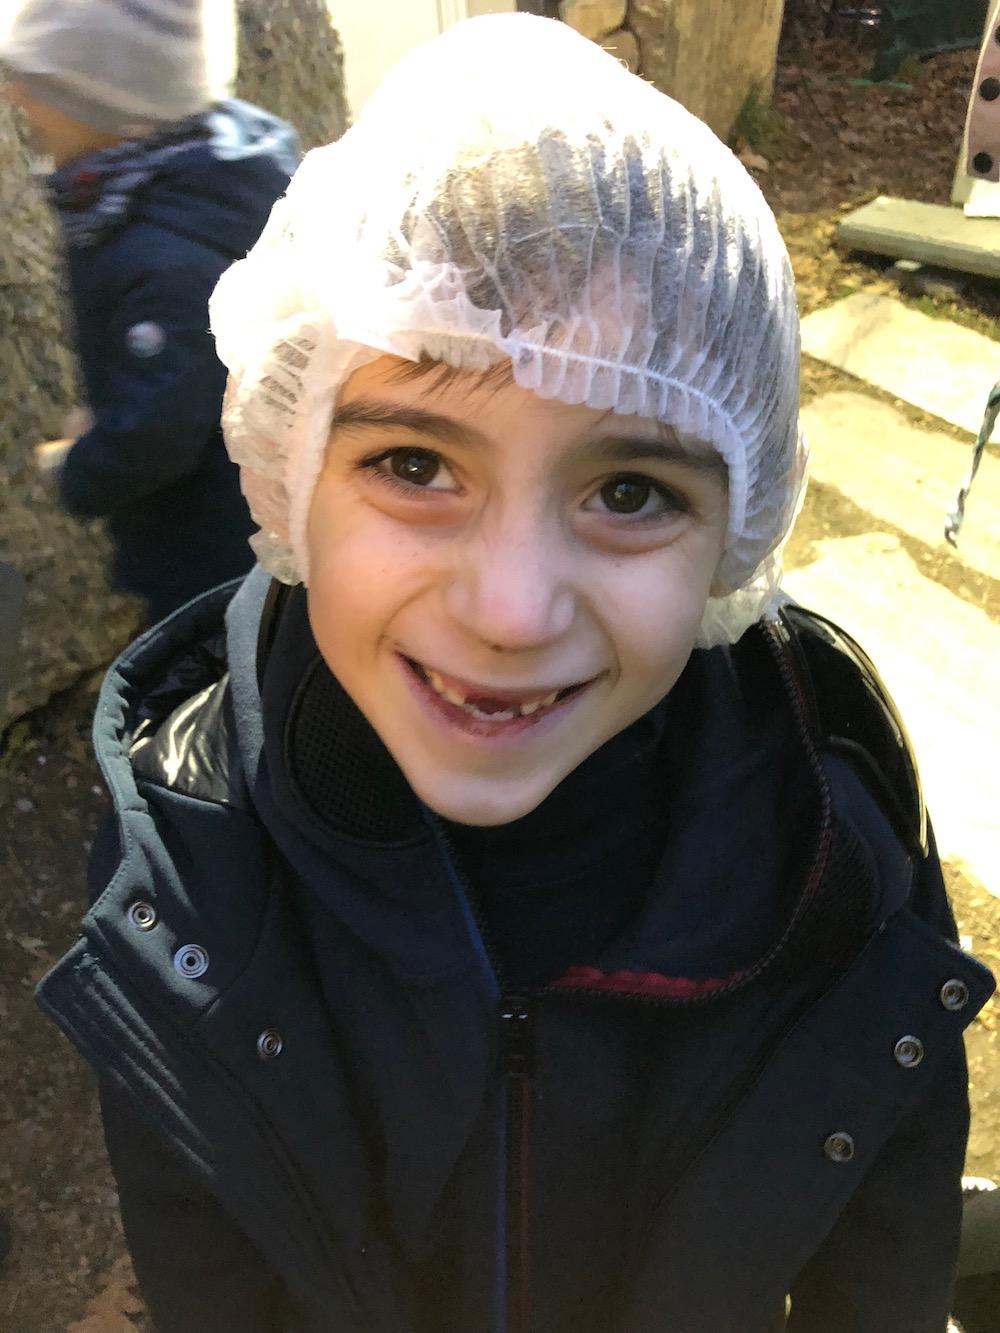 bambino-sorride-grotta-di-babbo-natale